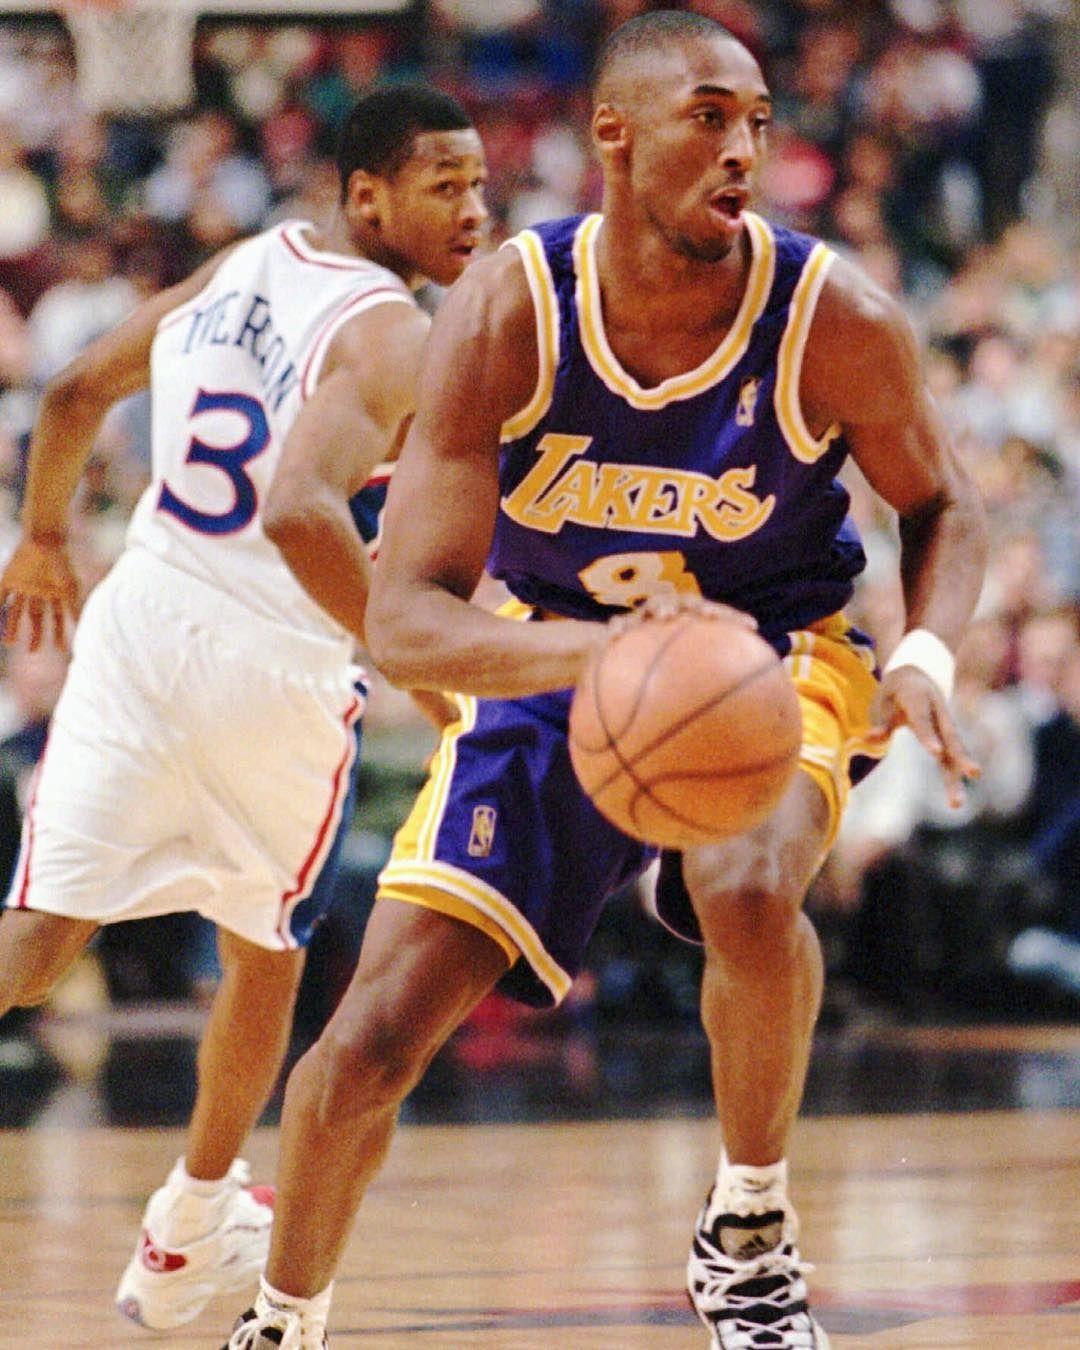 Pin on Kobe Bryant Number 8